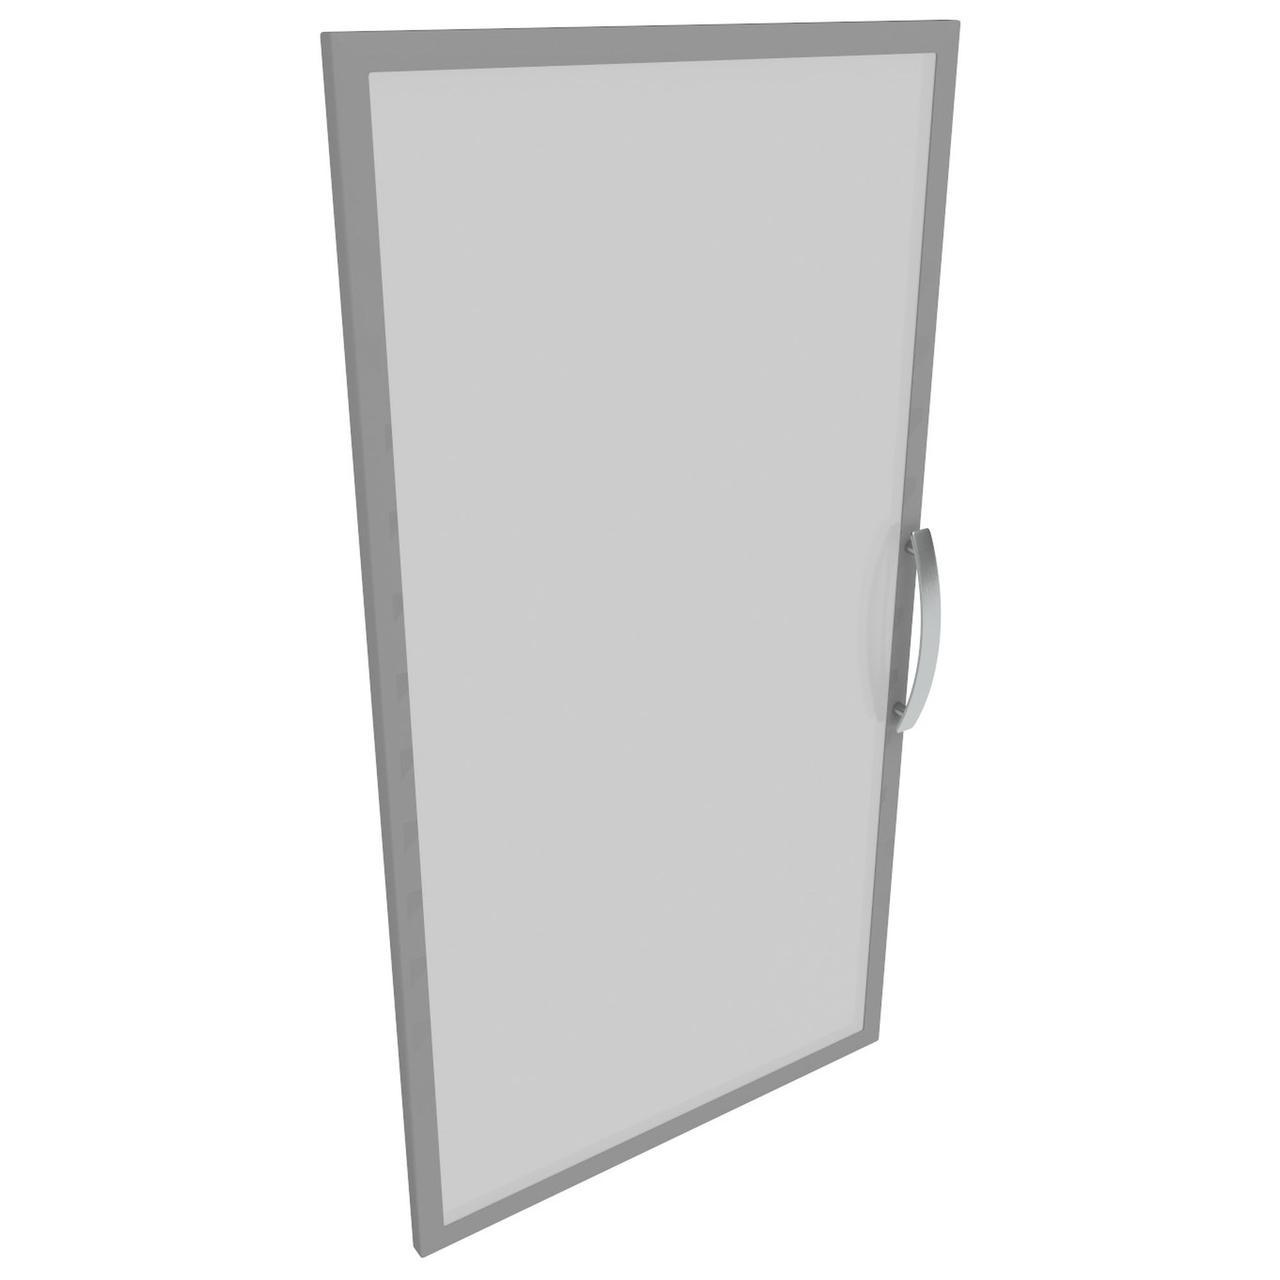 Дверца 3-х секционная М23R АртМобил (404х18х1183мм) стекло/кромка алюм